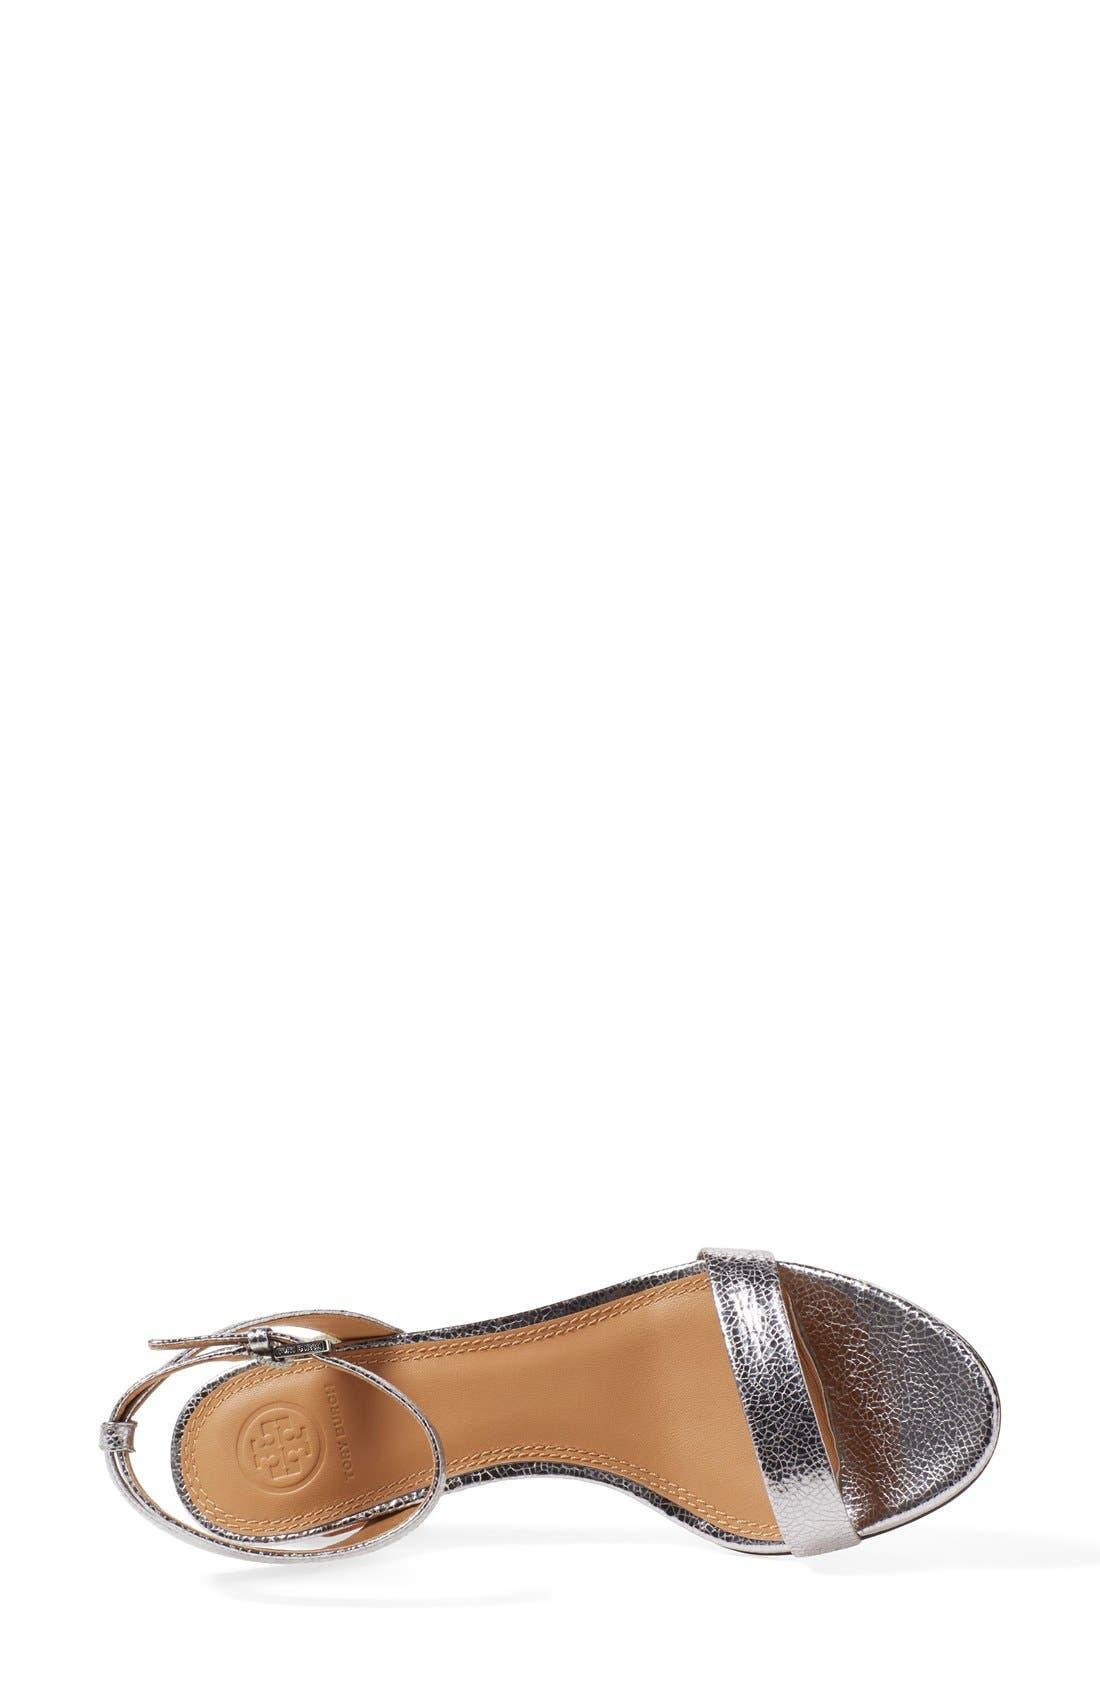 'Elana' Ankle Strap Sandal,                             Alternate thumbnail 4, color,                             043